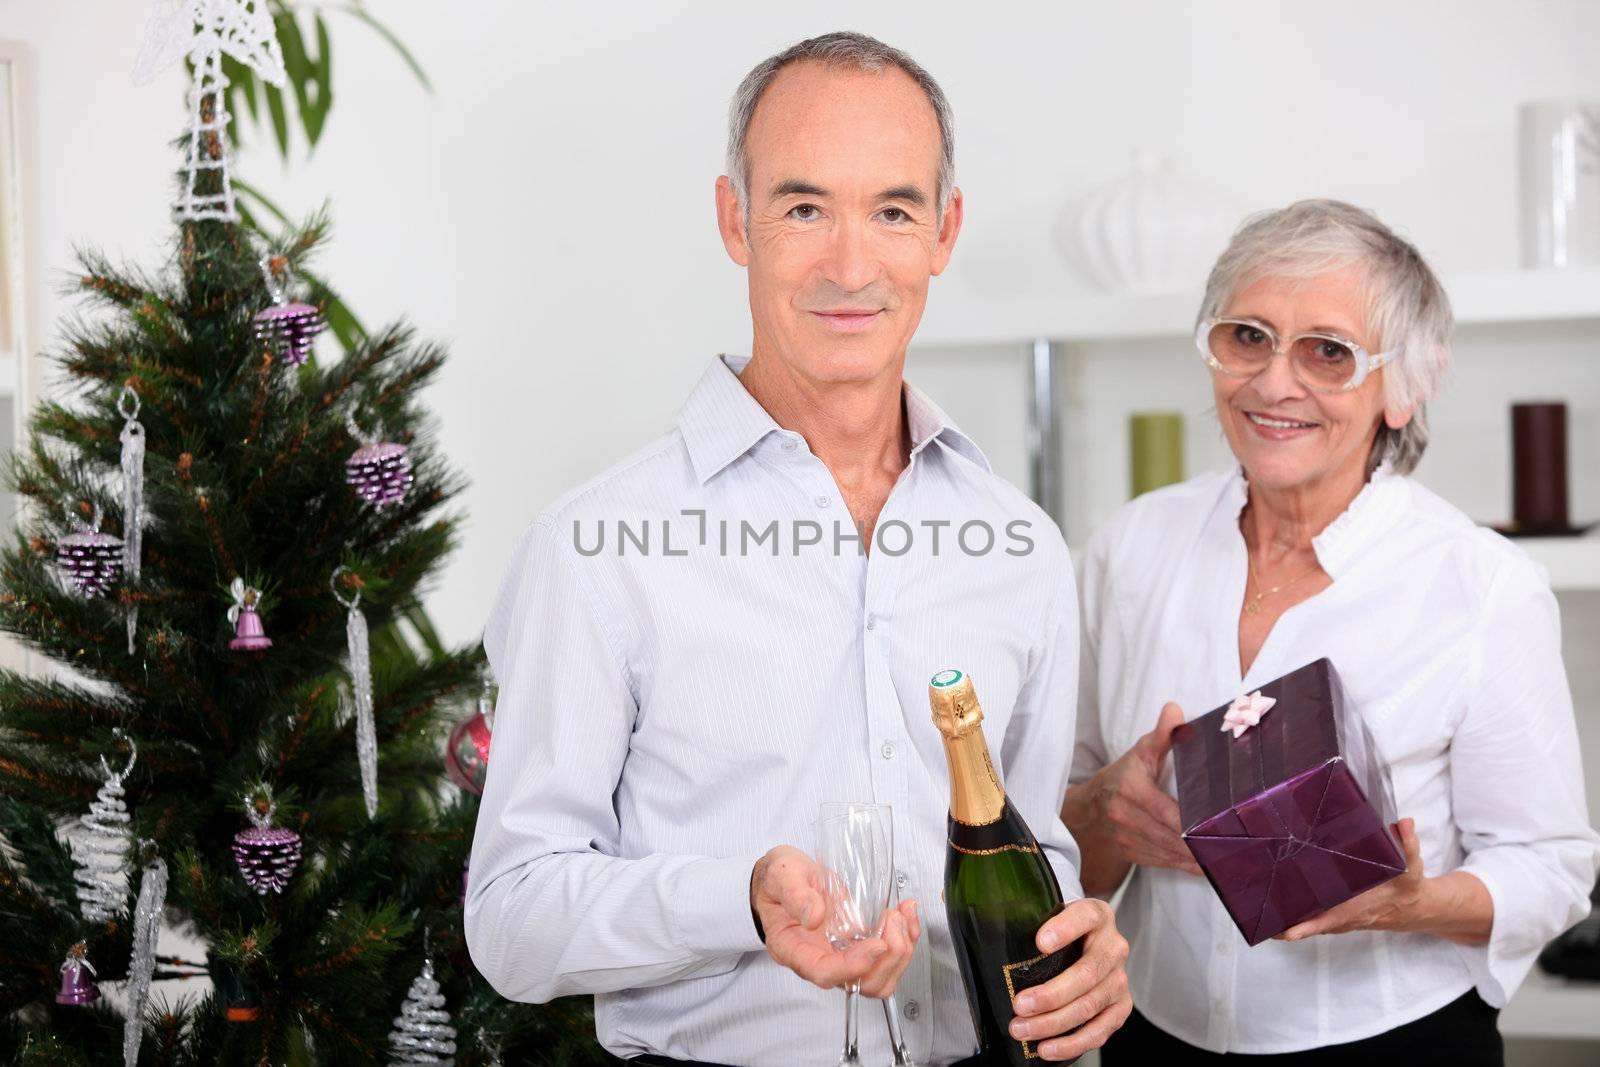 Elderly couple celebrating together at Christmas